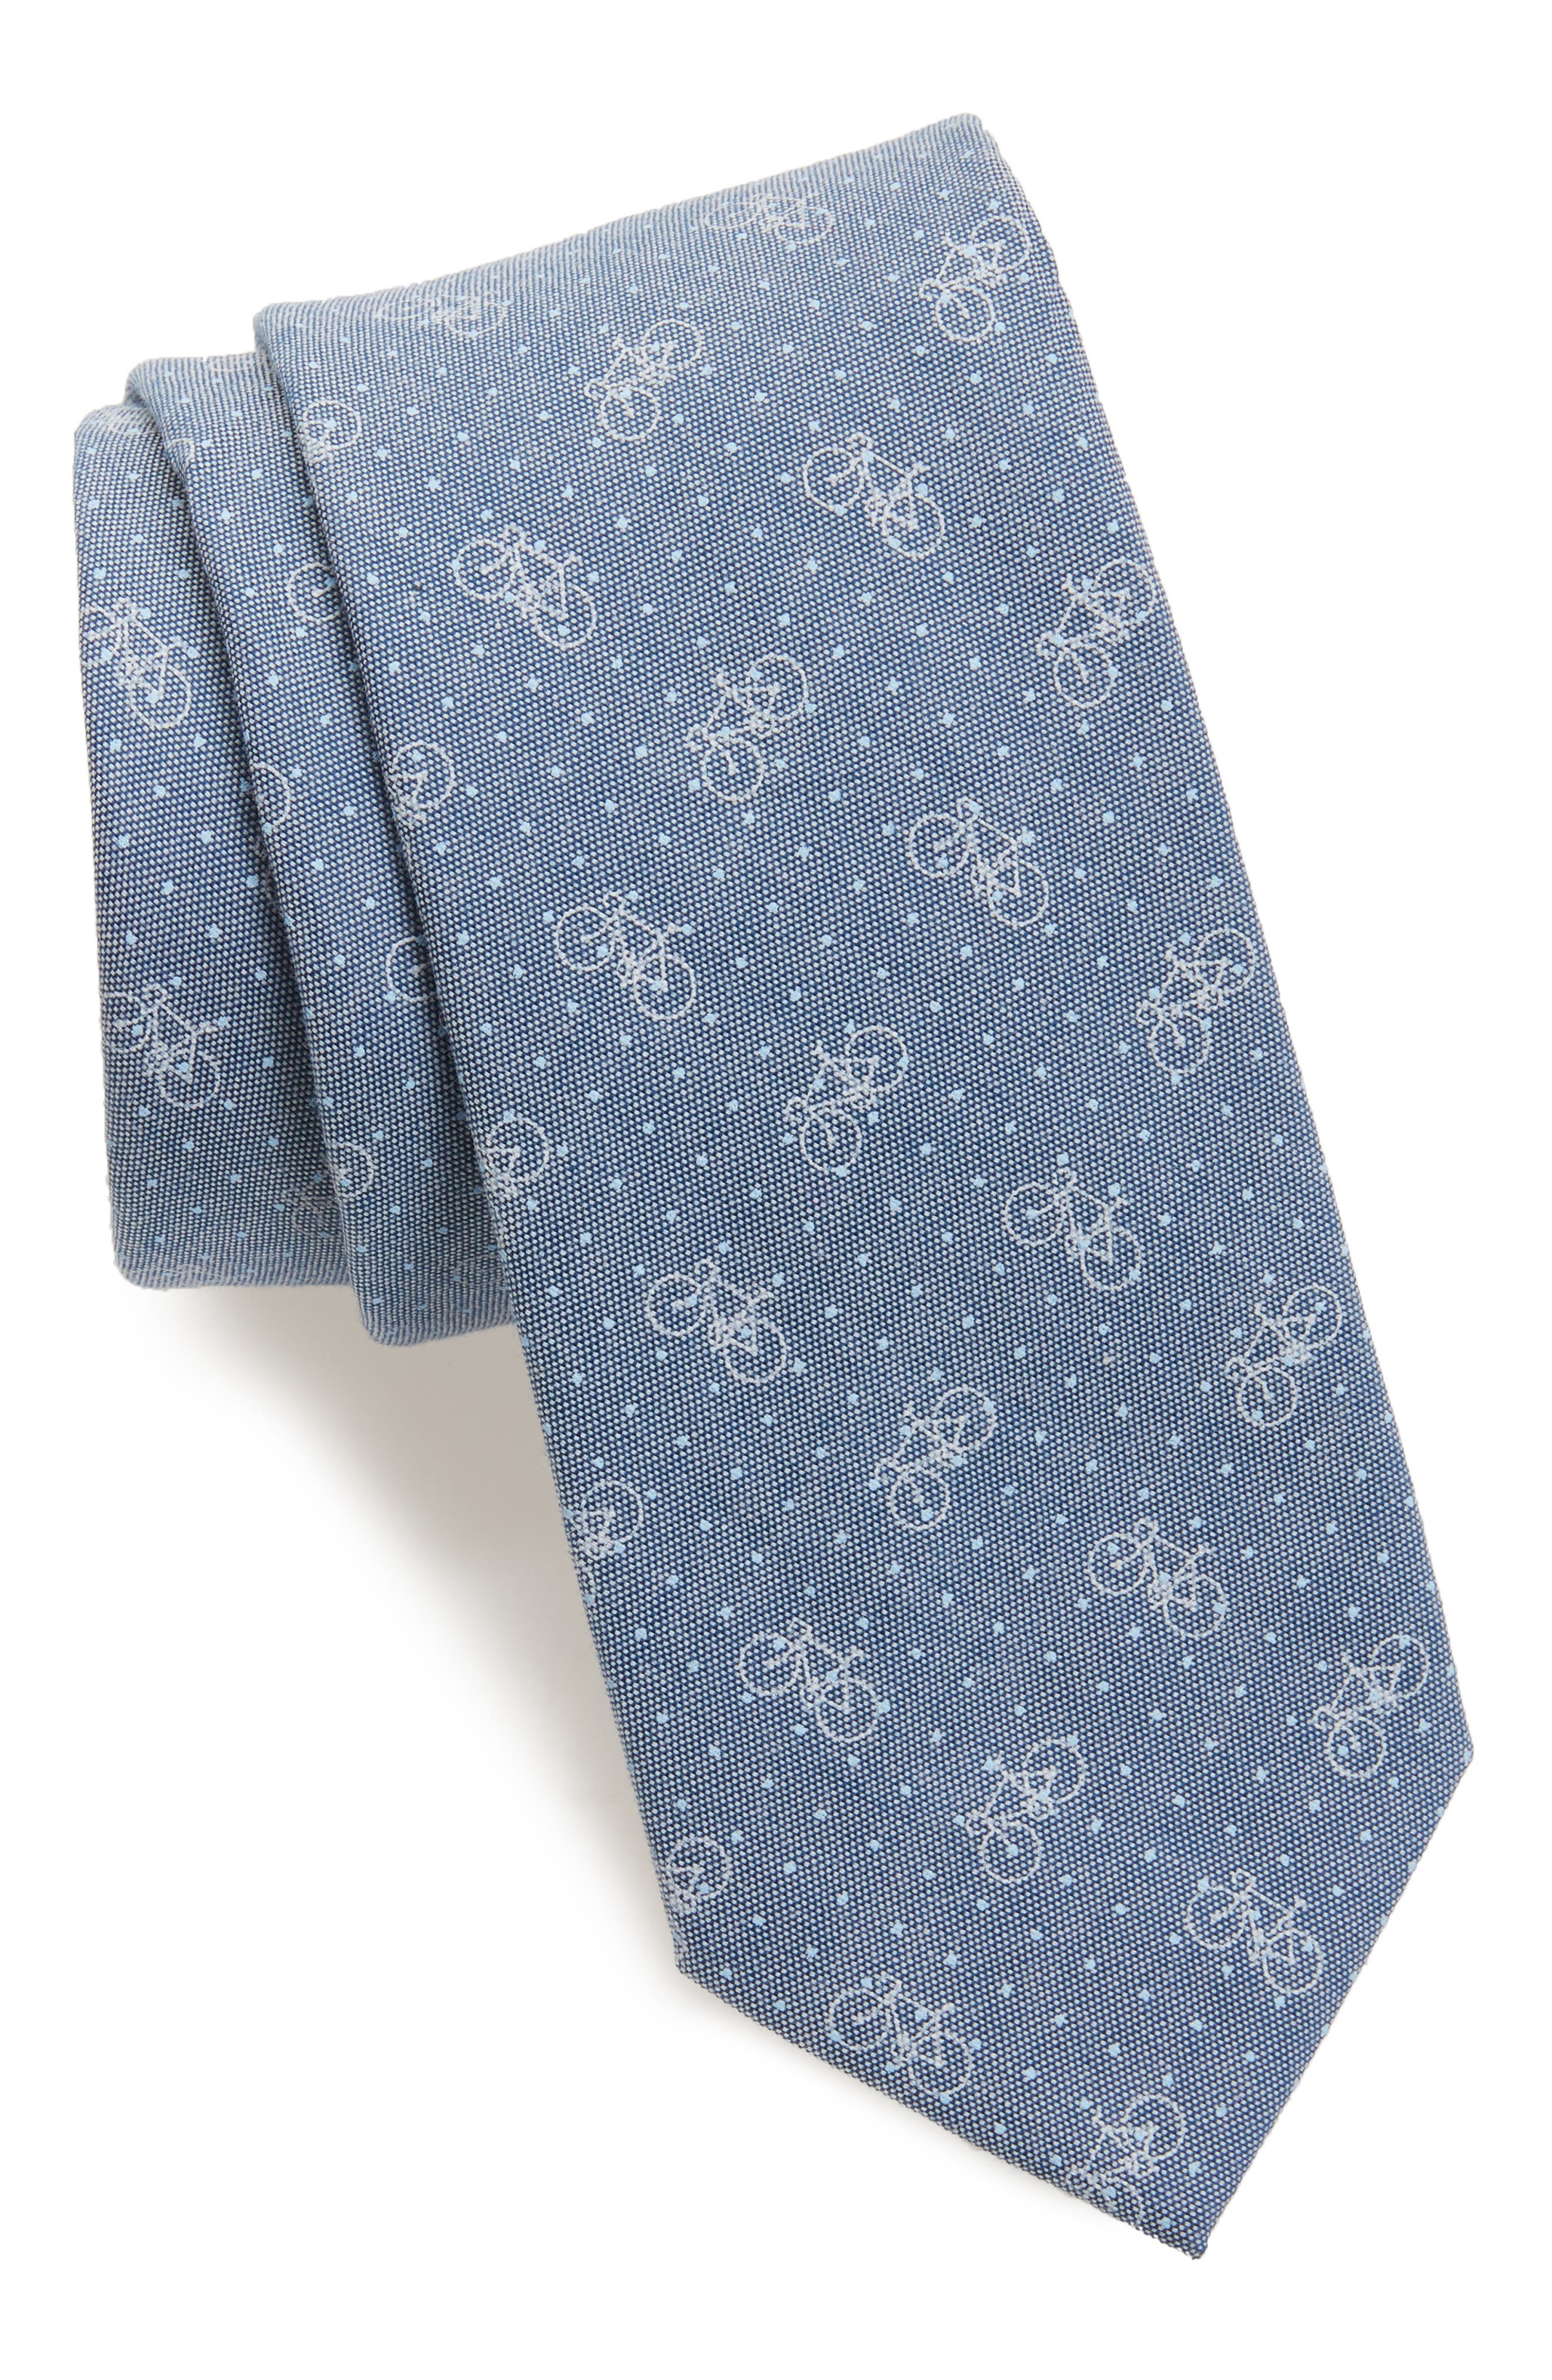 Bicycle & Dot Cotton Tie,                             Main thumbnail 1, color,                             400